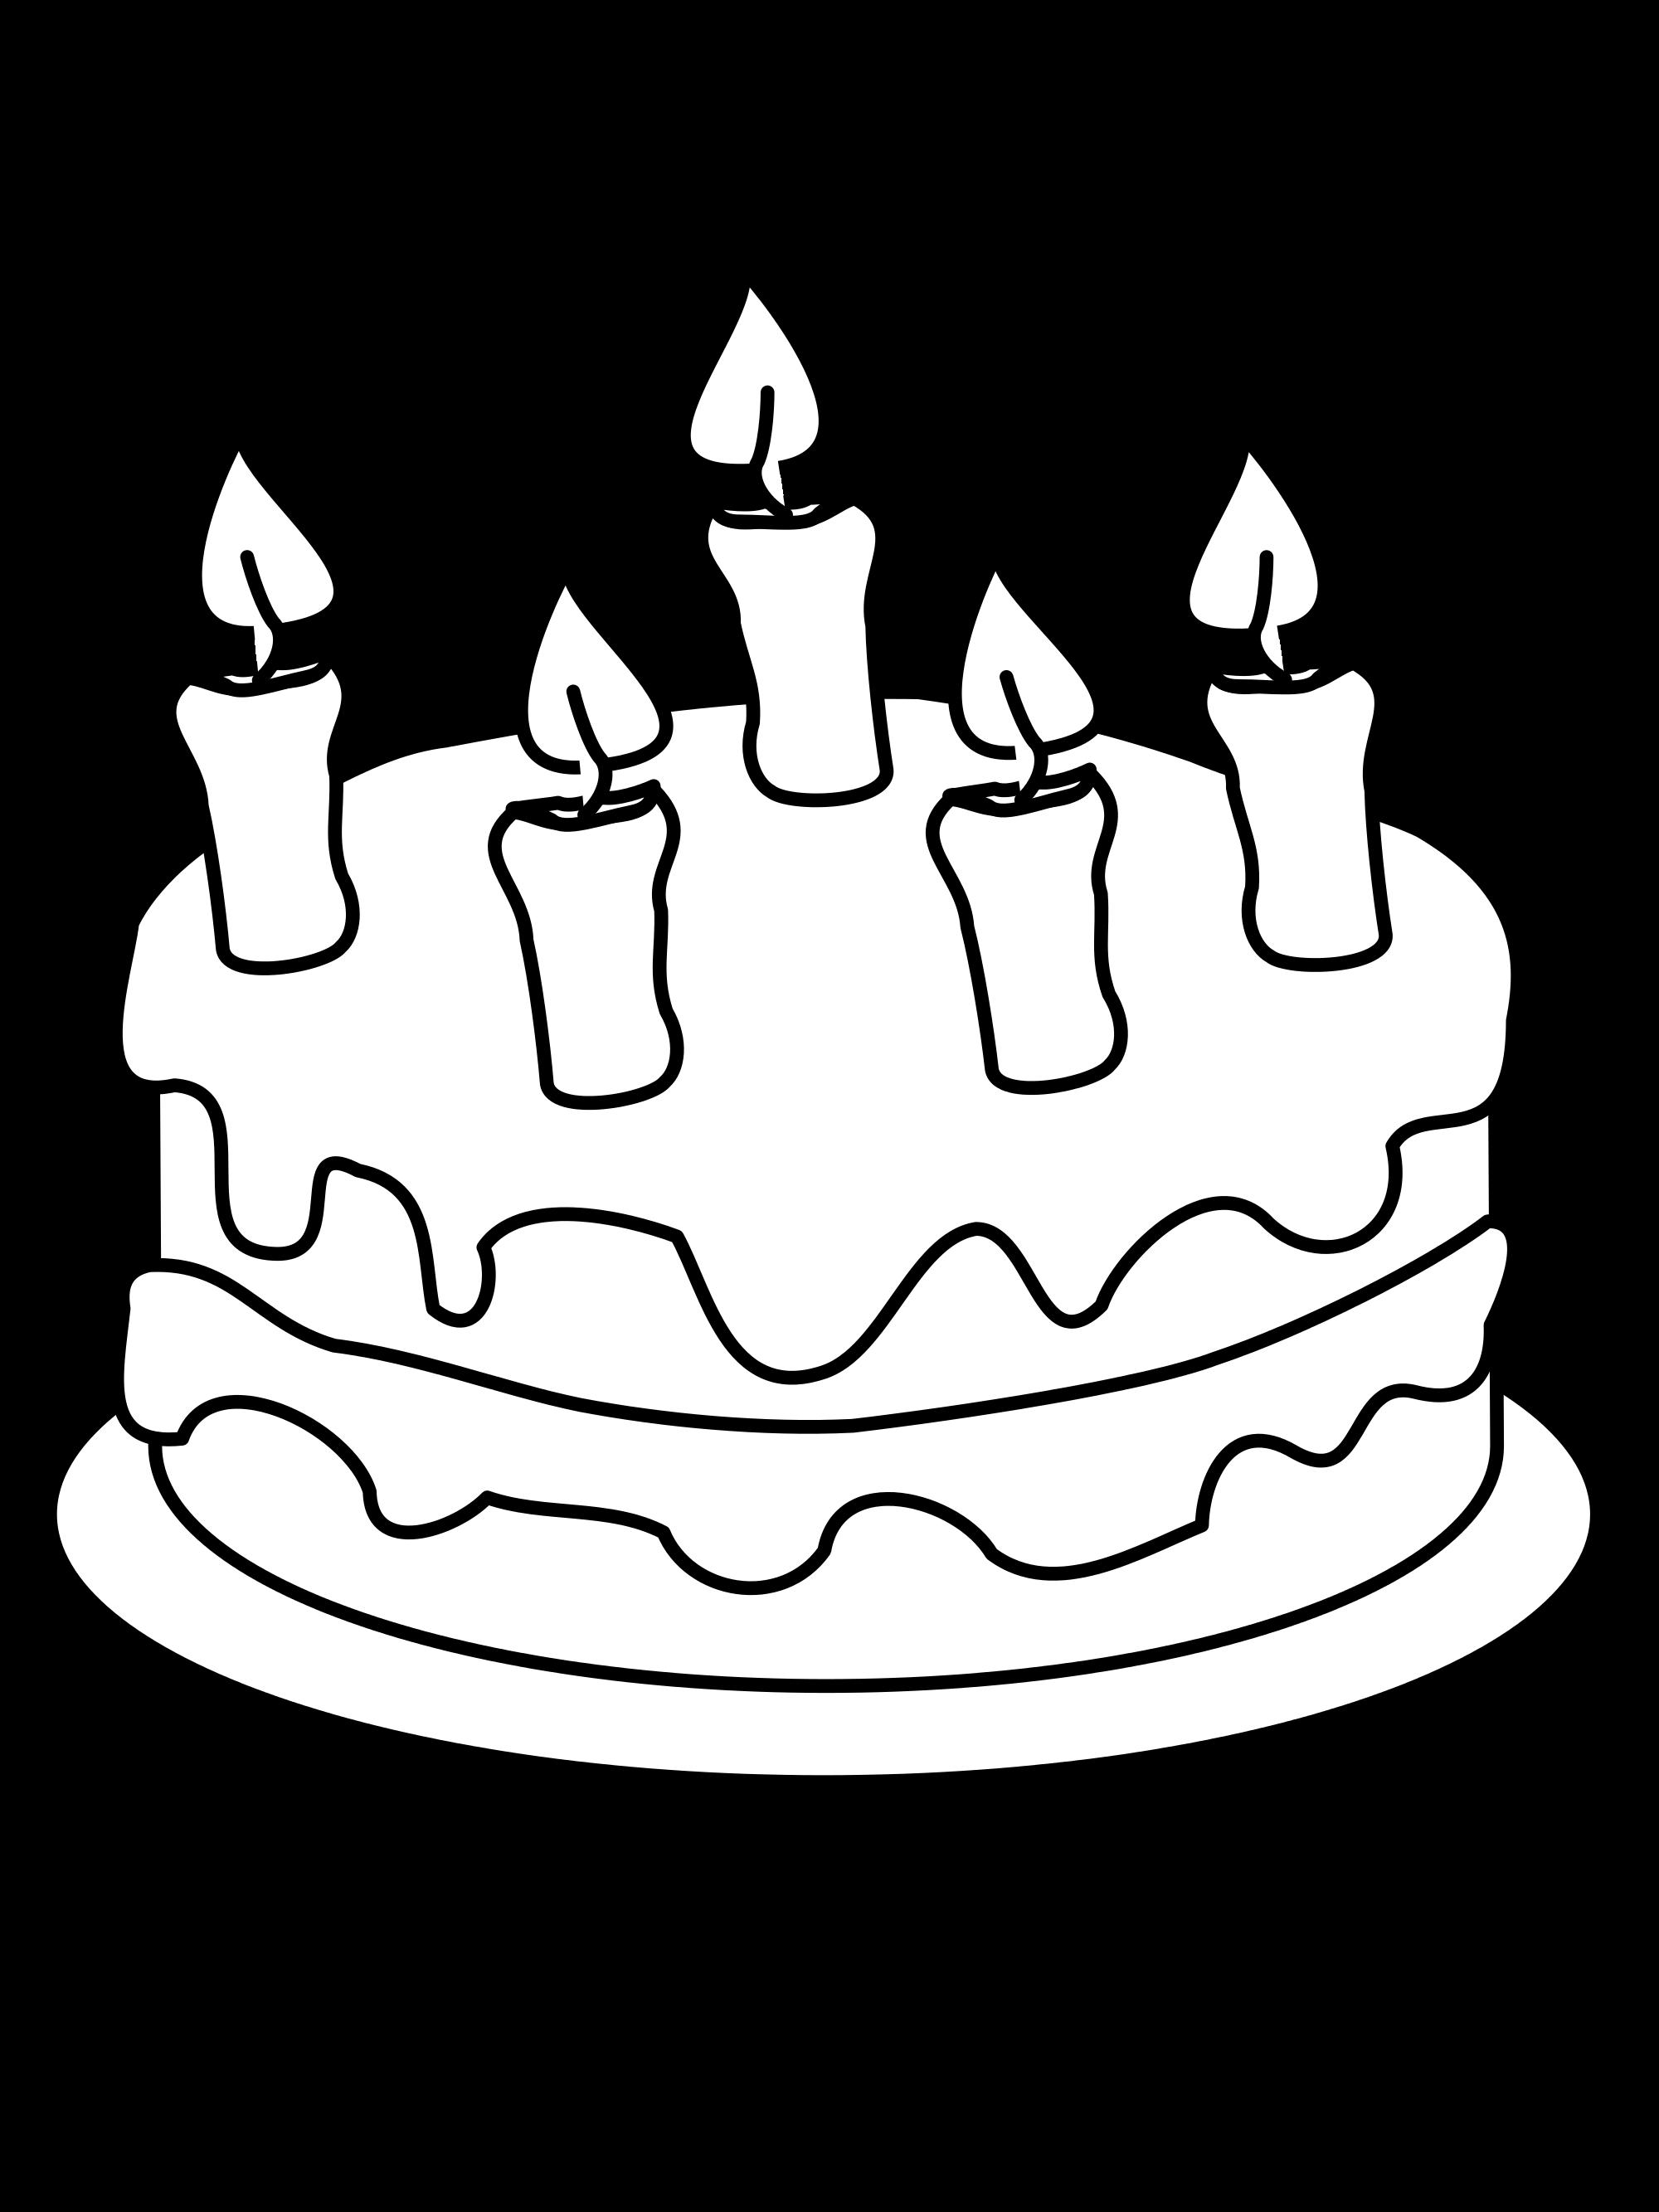 2000x2667 Printable Birthday Cake Drawing